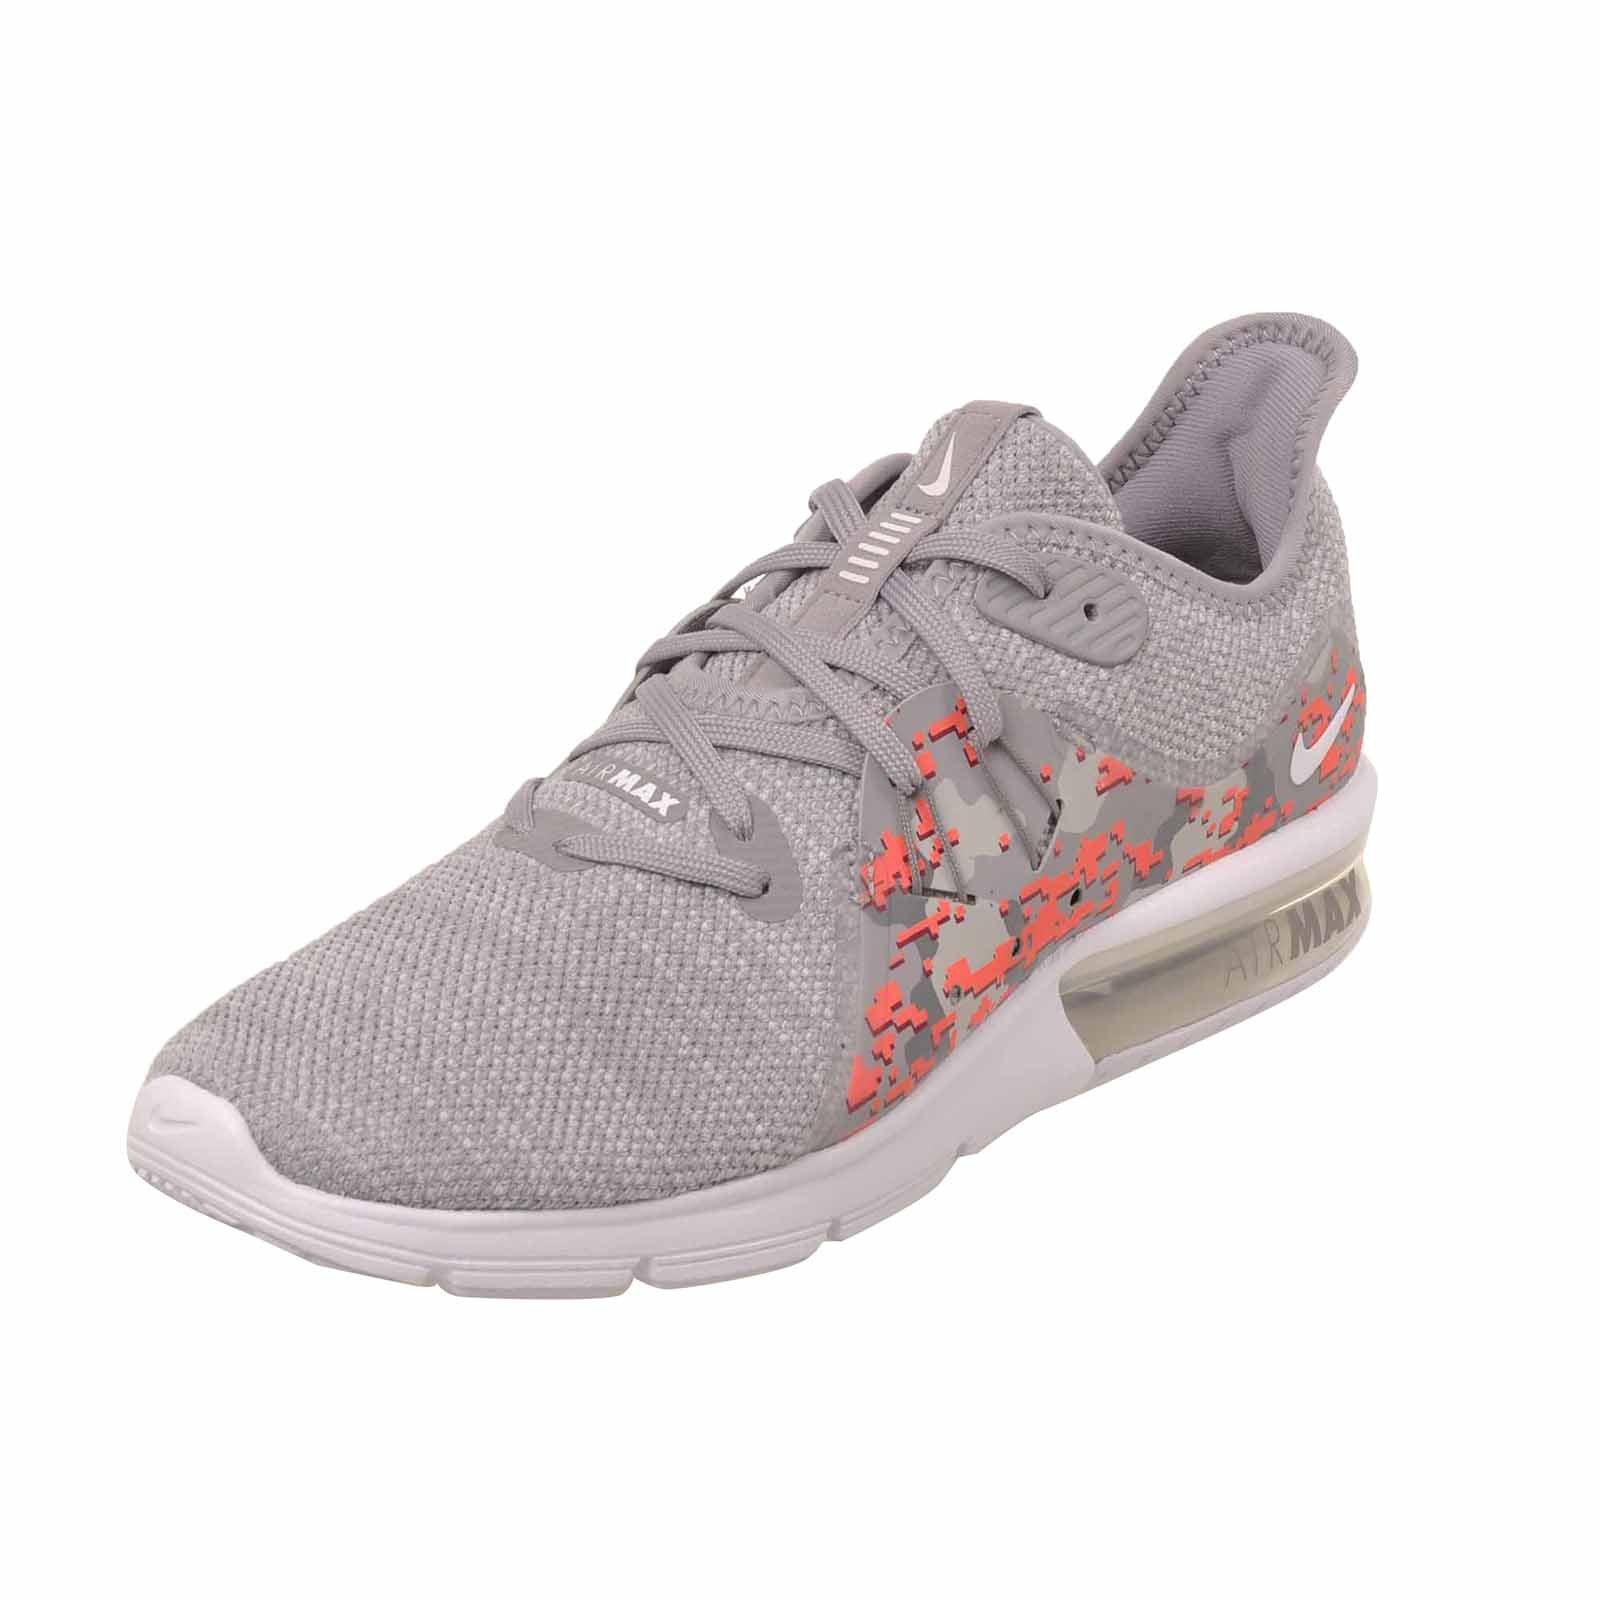 best website d0226 2824b Galleon - Nike Women s Air Max Sequent 3 C Running Shoes-White Vast Grey-9.5